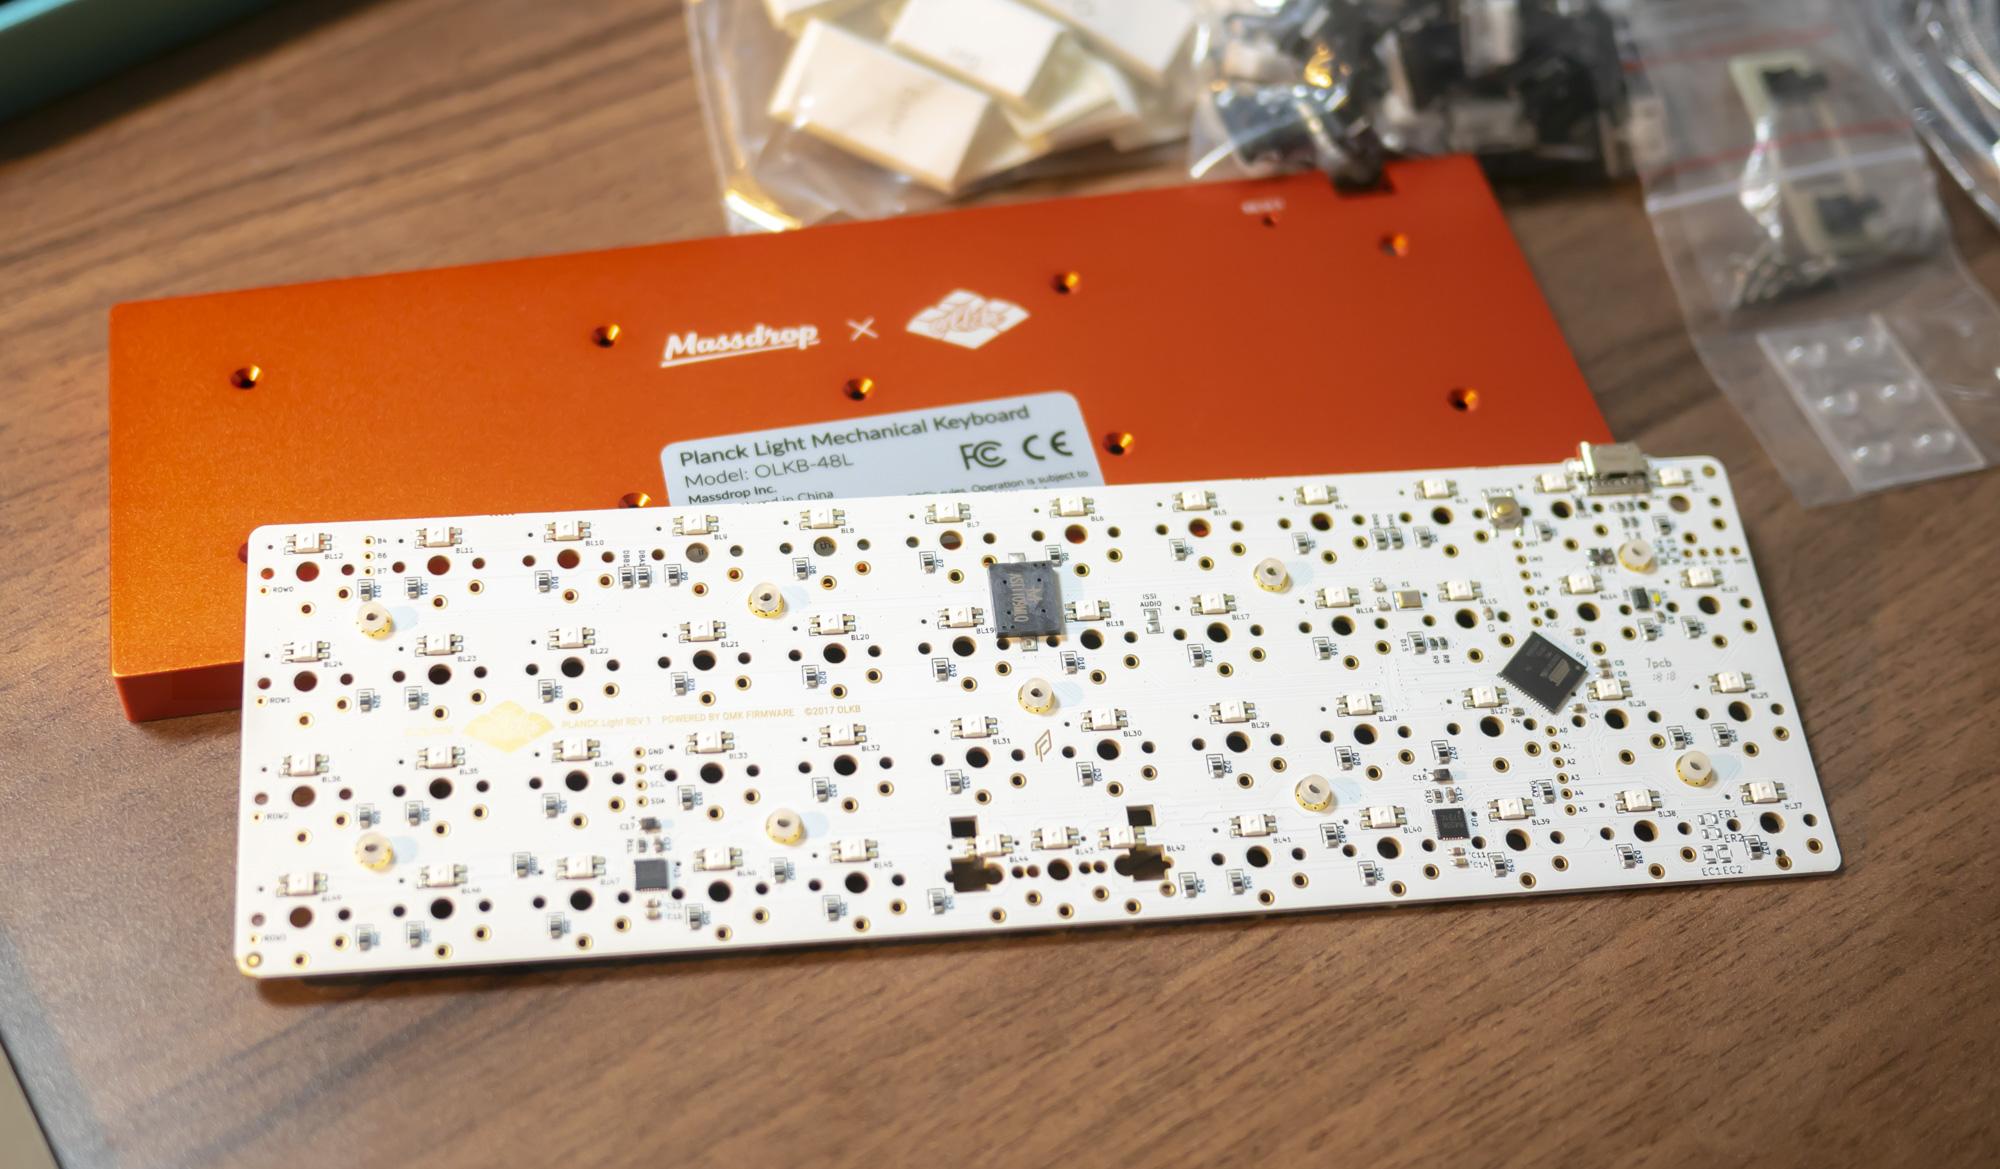 Planck Light PCB